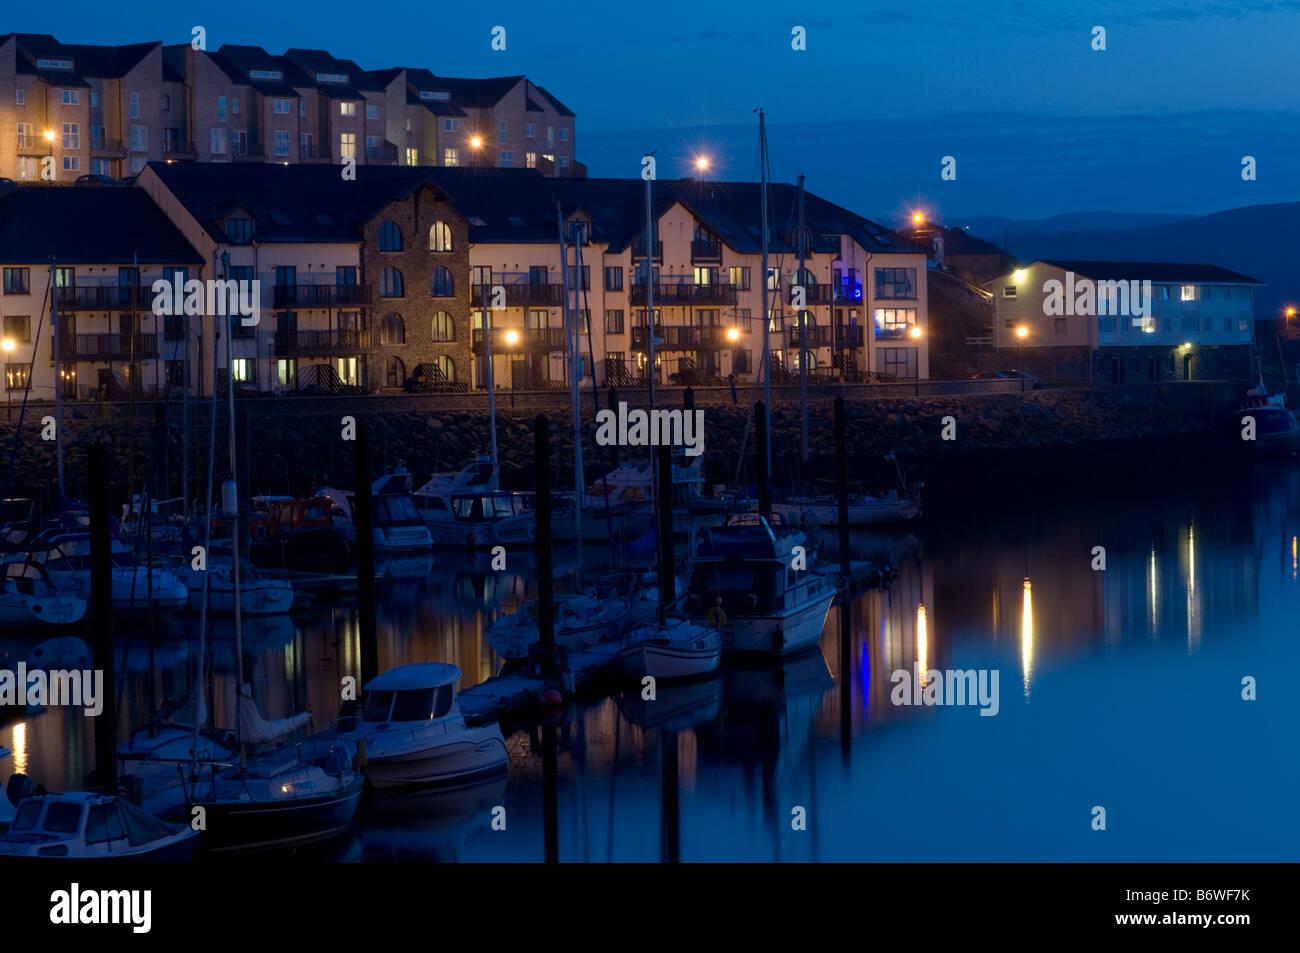 Waterside flats and apartments at dusk Aberystwyth Marina west wales UK - Stock Image